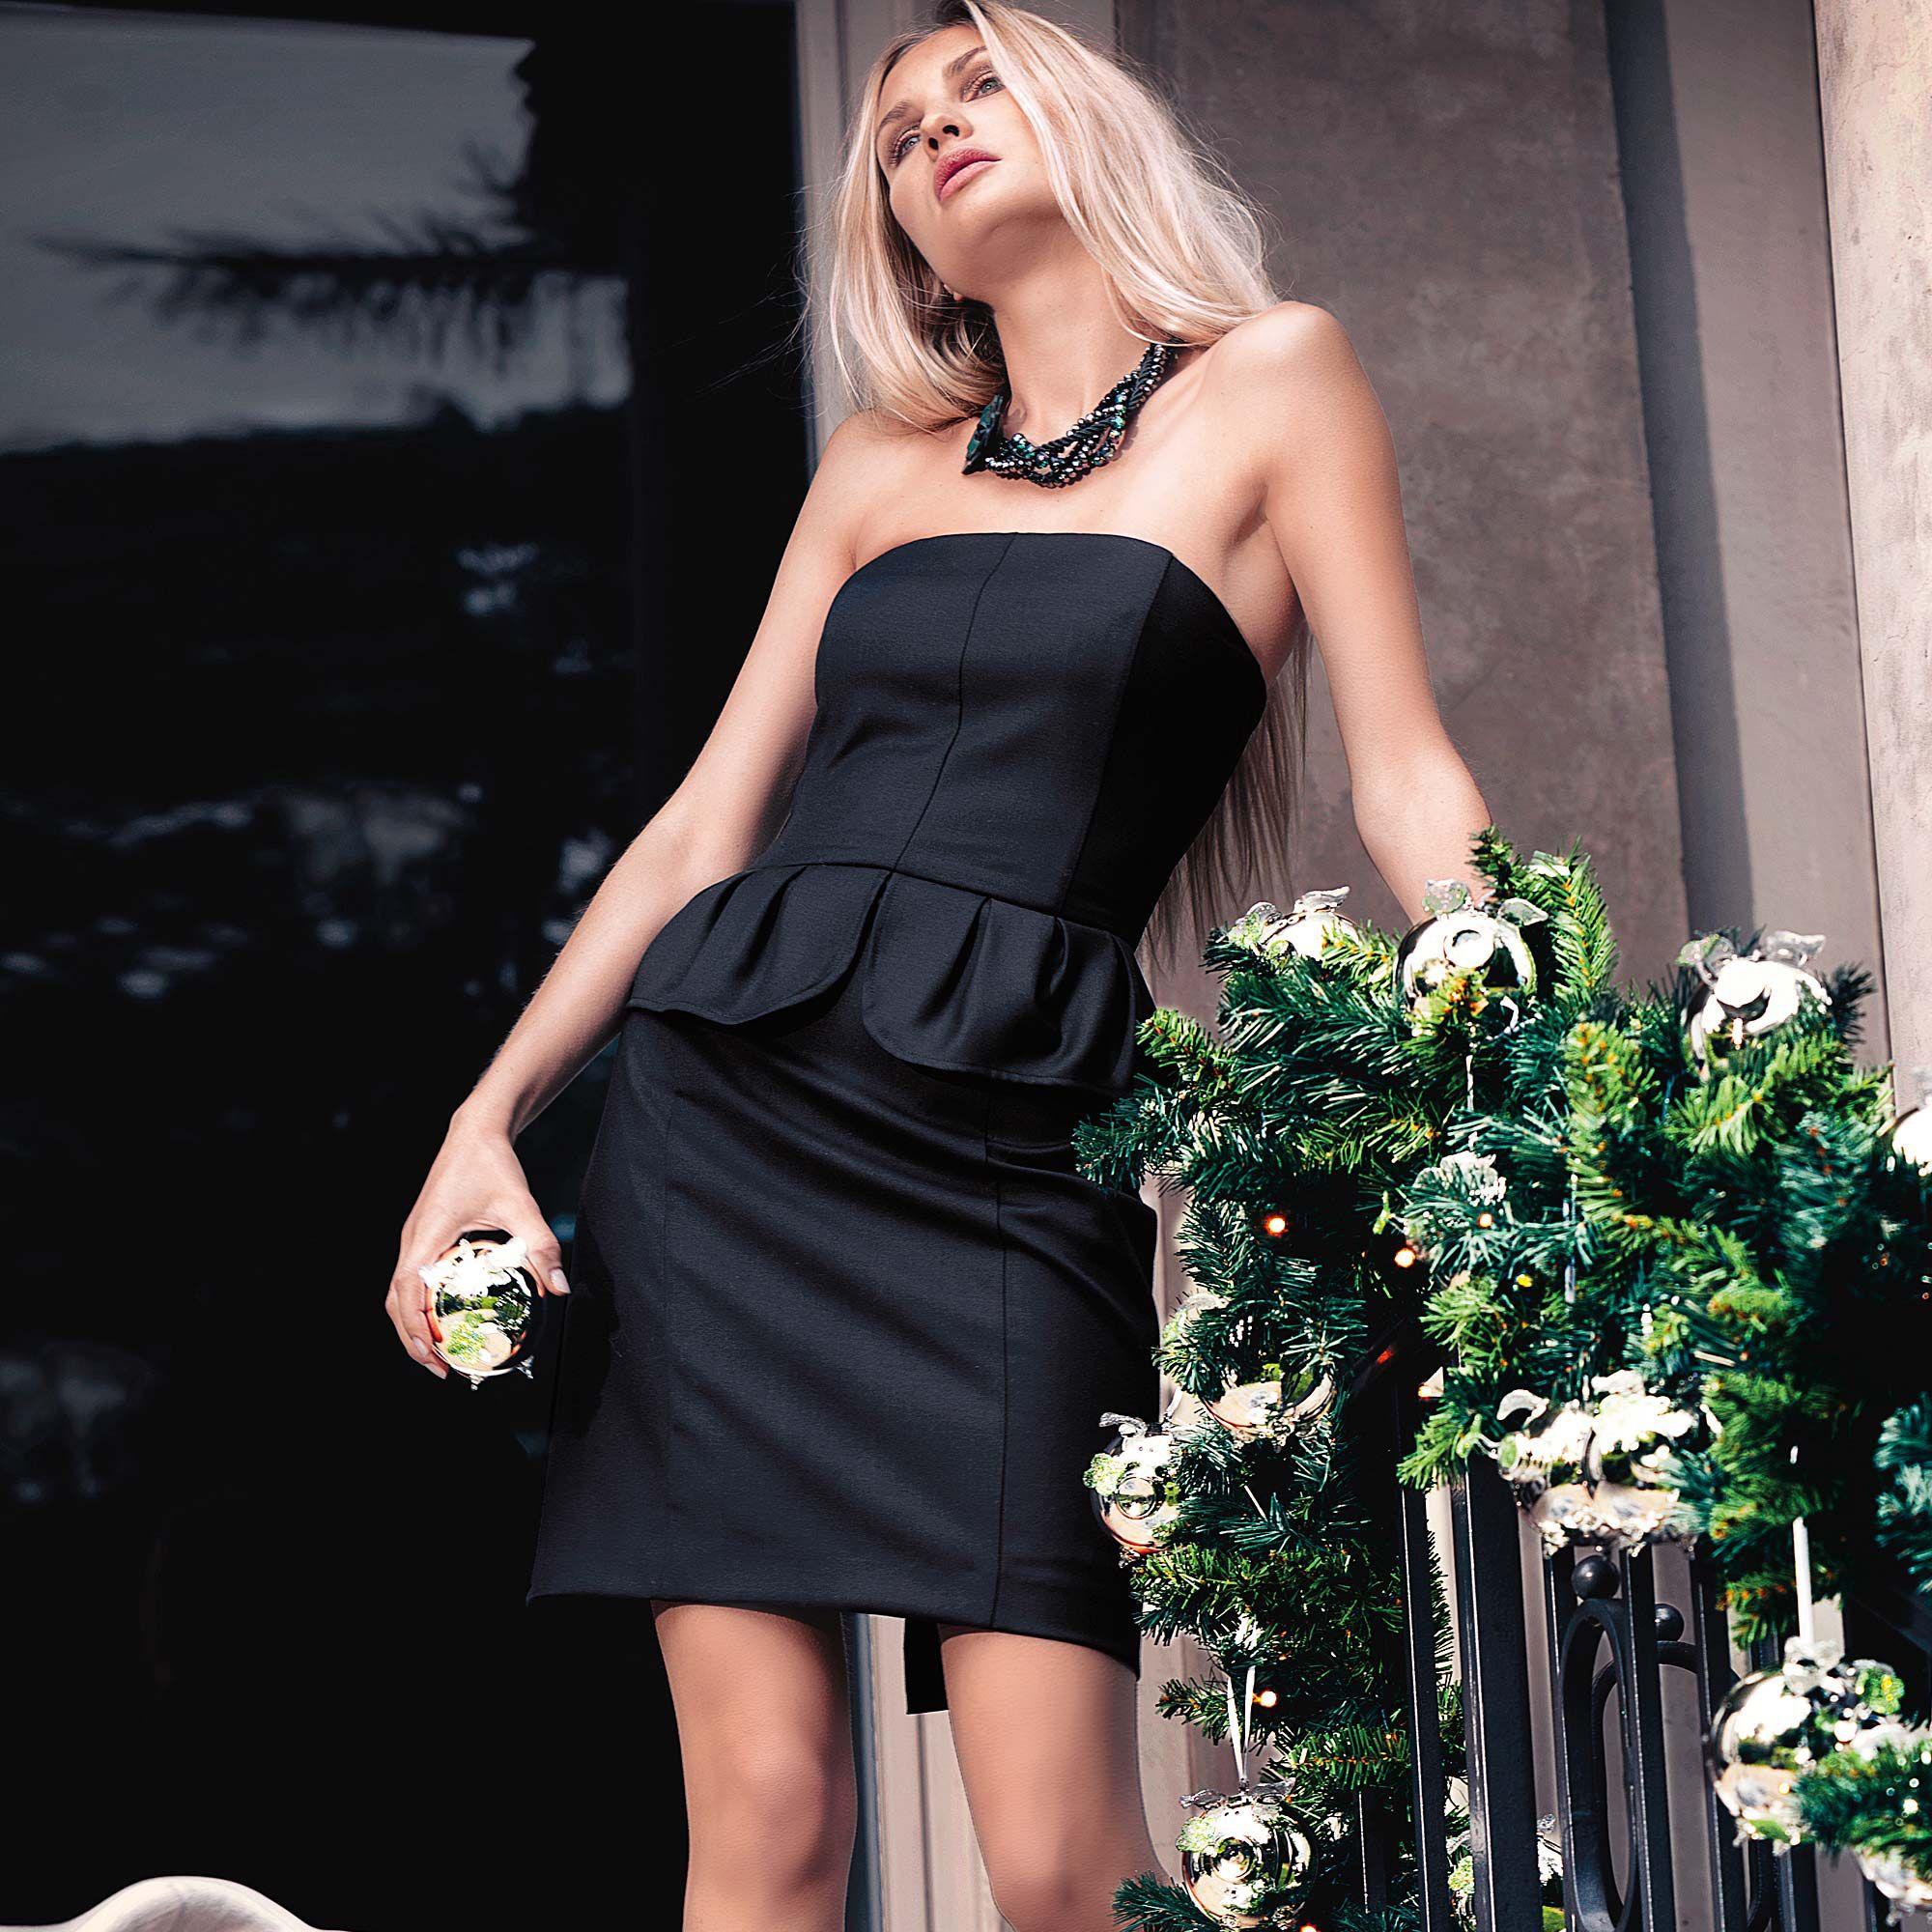 DIVINA Kleid / dress by DIVINA  #impressionen #fashion #mode